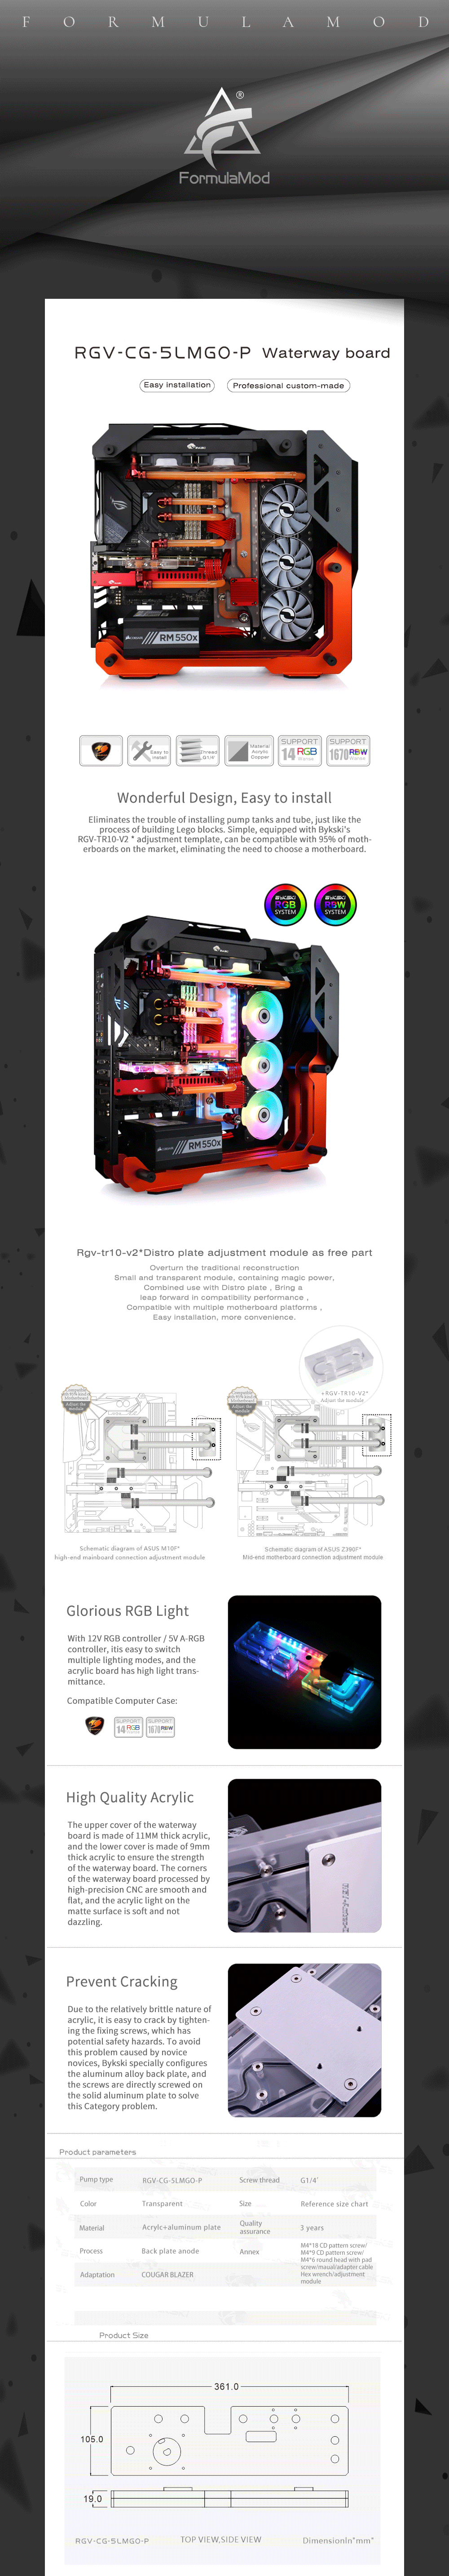 Bykski Waterway Cooling Kit For COUGAR BLAZER Case, 5V ARGB, For Single GPU Building, RGV-CG-5LMGO-P